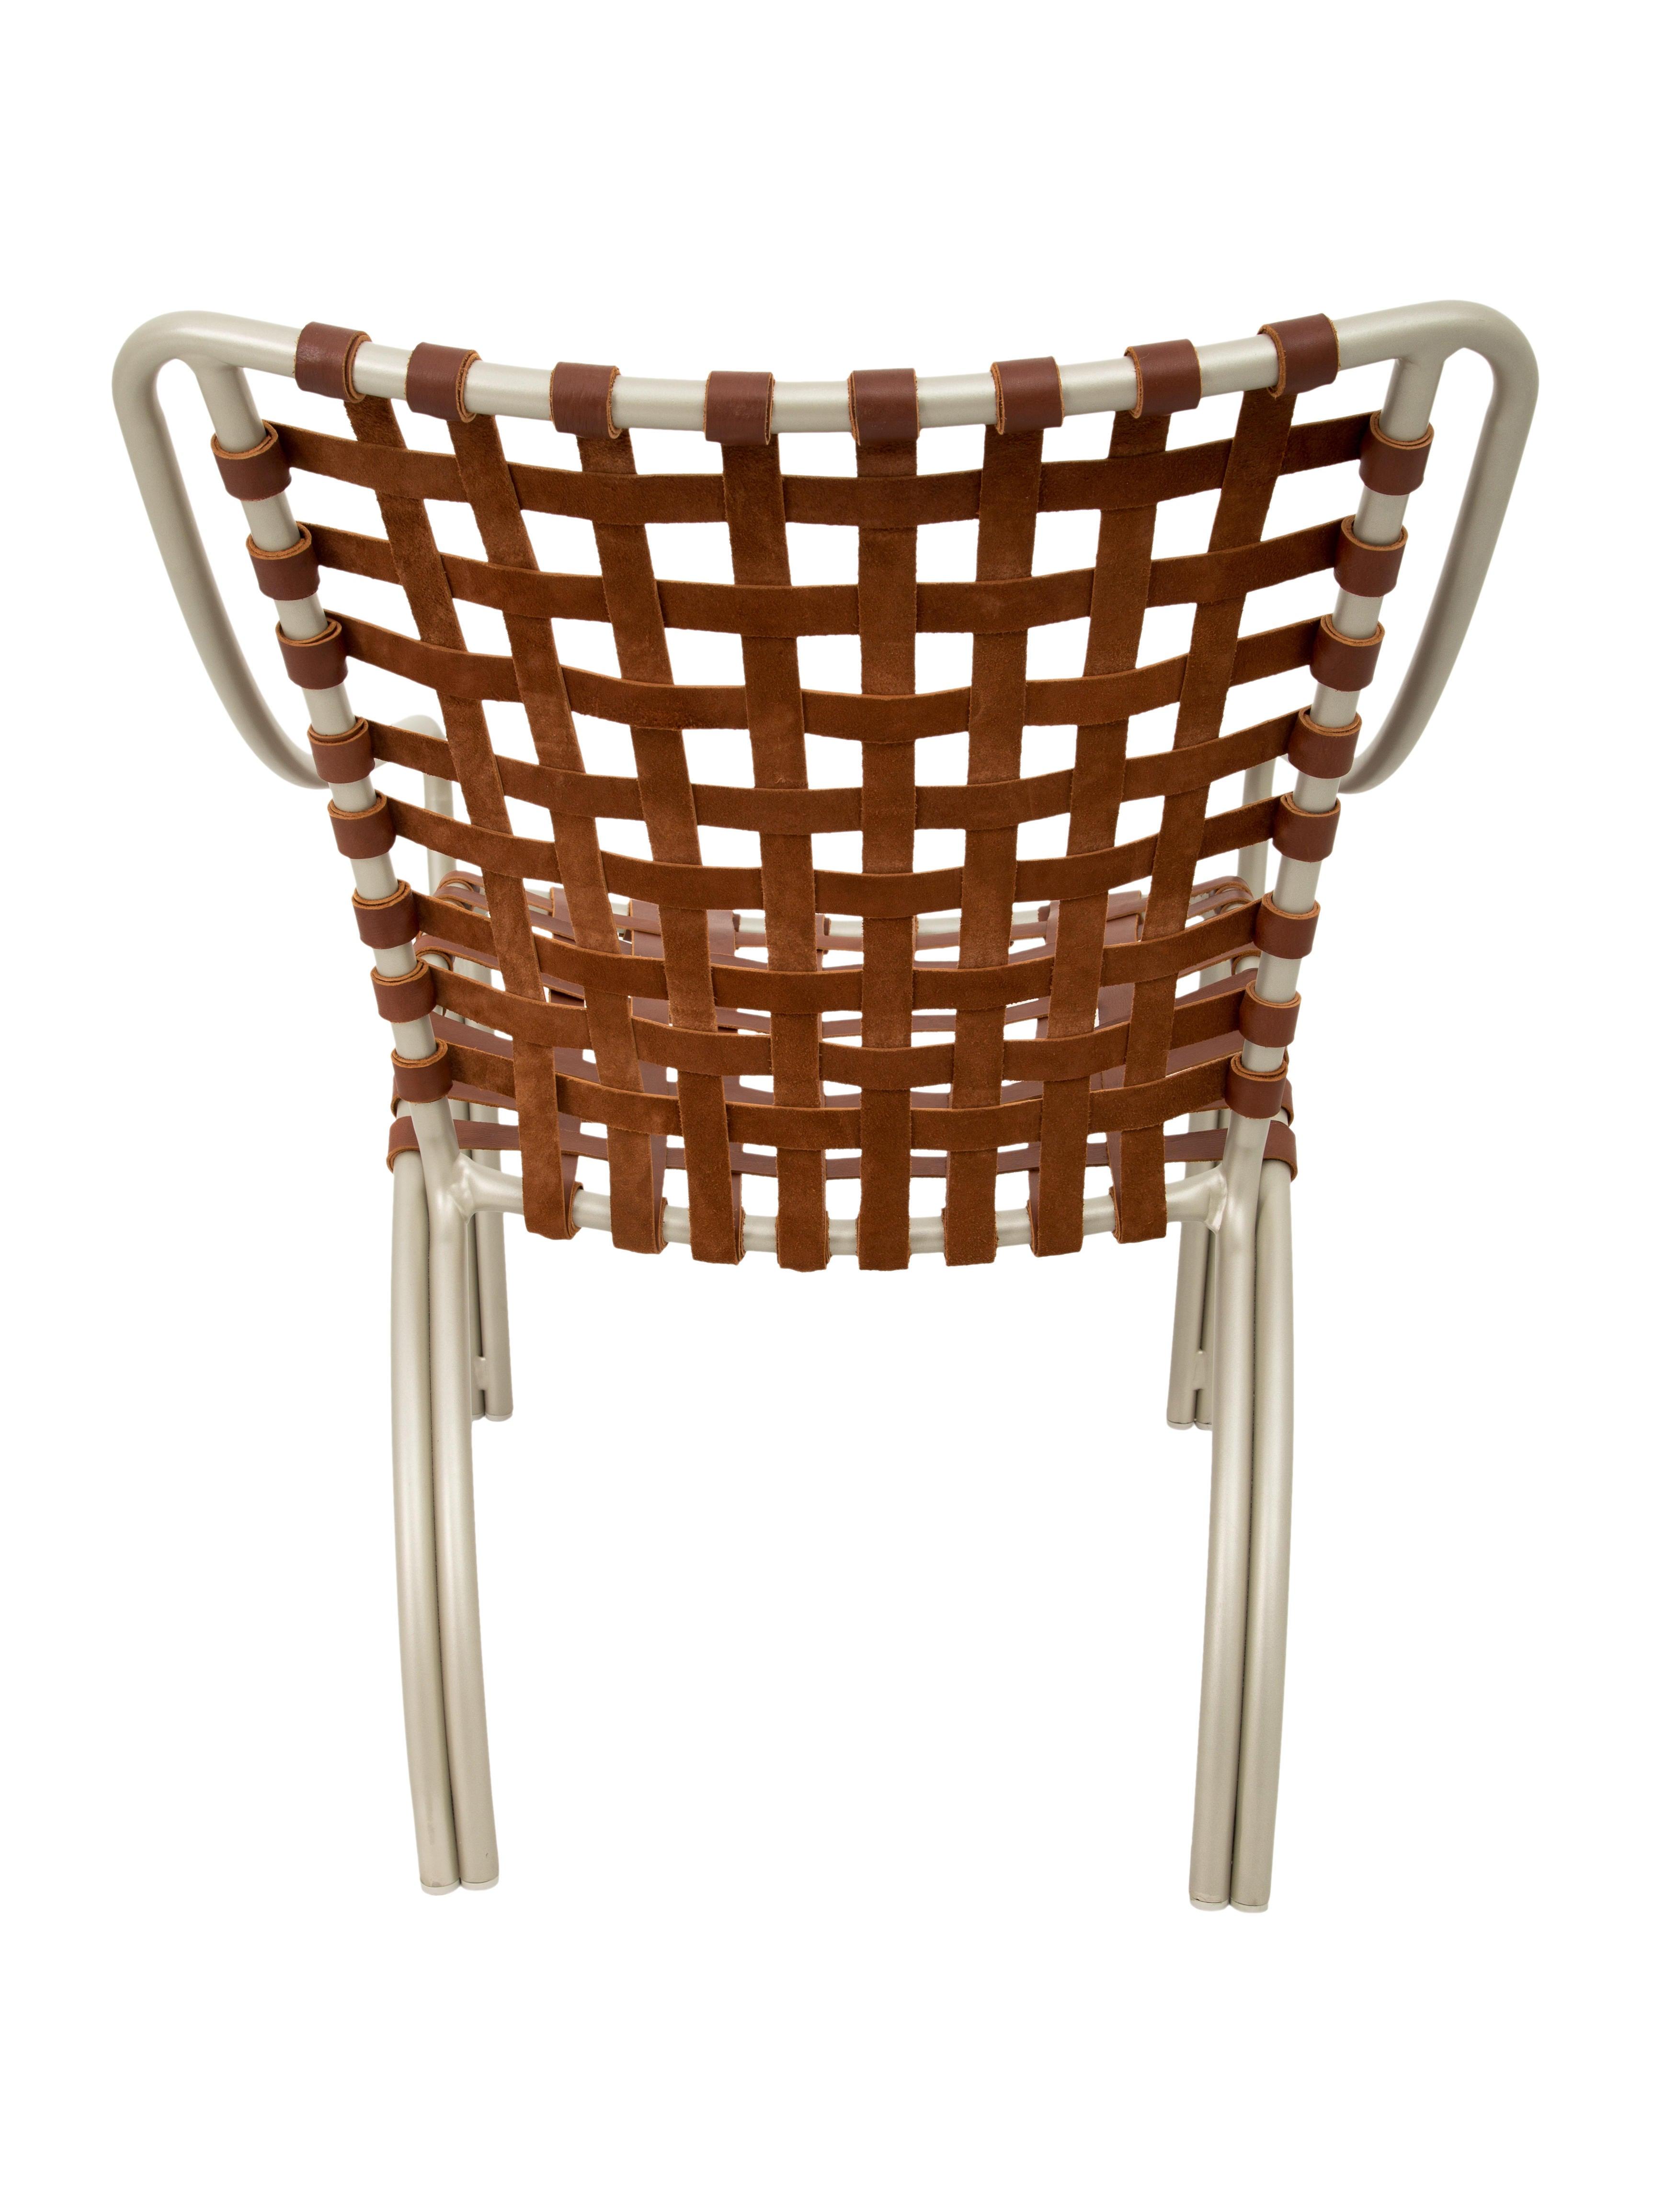 Brown Jordan Lounge Chair Furniture CHAIR